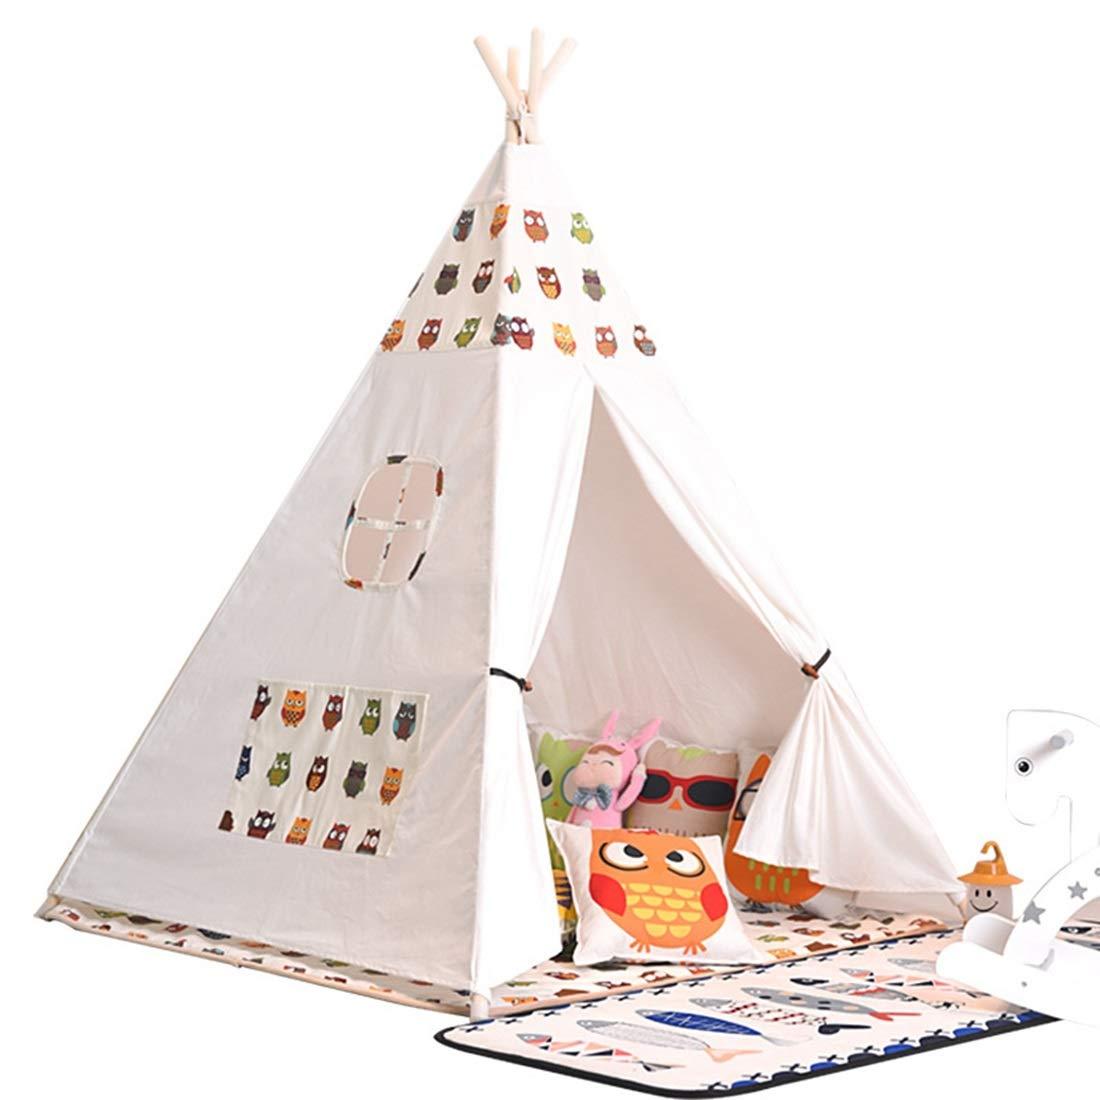 KERVINJESSIE インディアン 子供用 テント 屋内 登山 ベビー プレイハウス ベビー おもちゃ テント プリンセス テント KERVINJESSIE B07JFJFLSS フクロウ